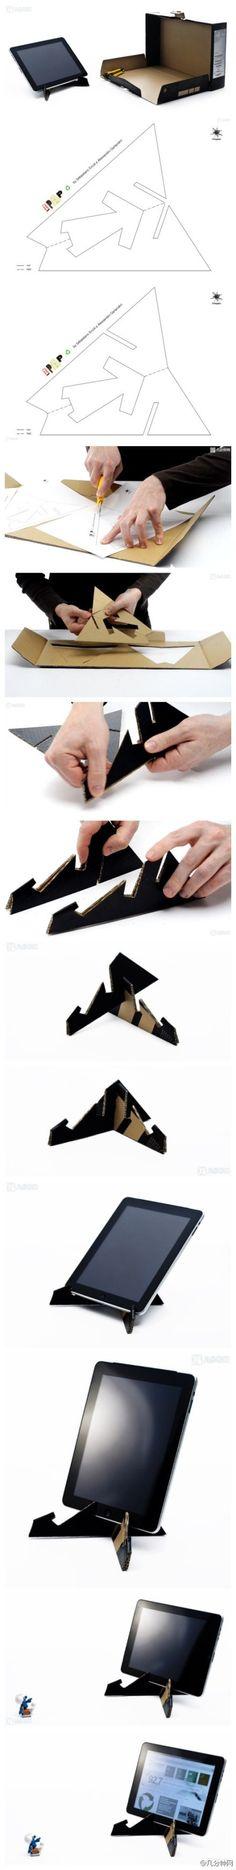 DIY Cardboard Tablet Stand